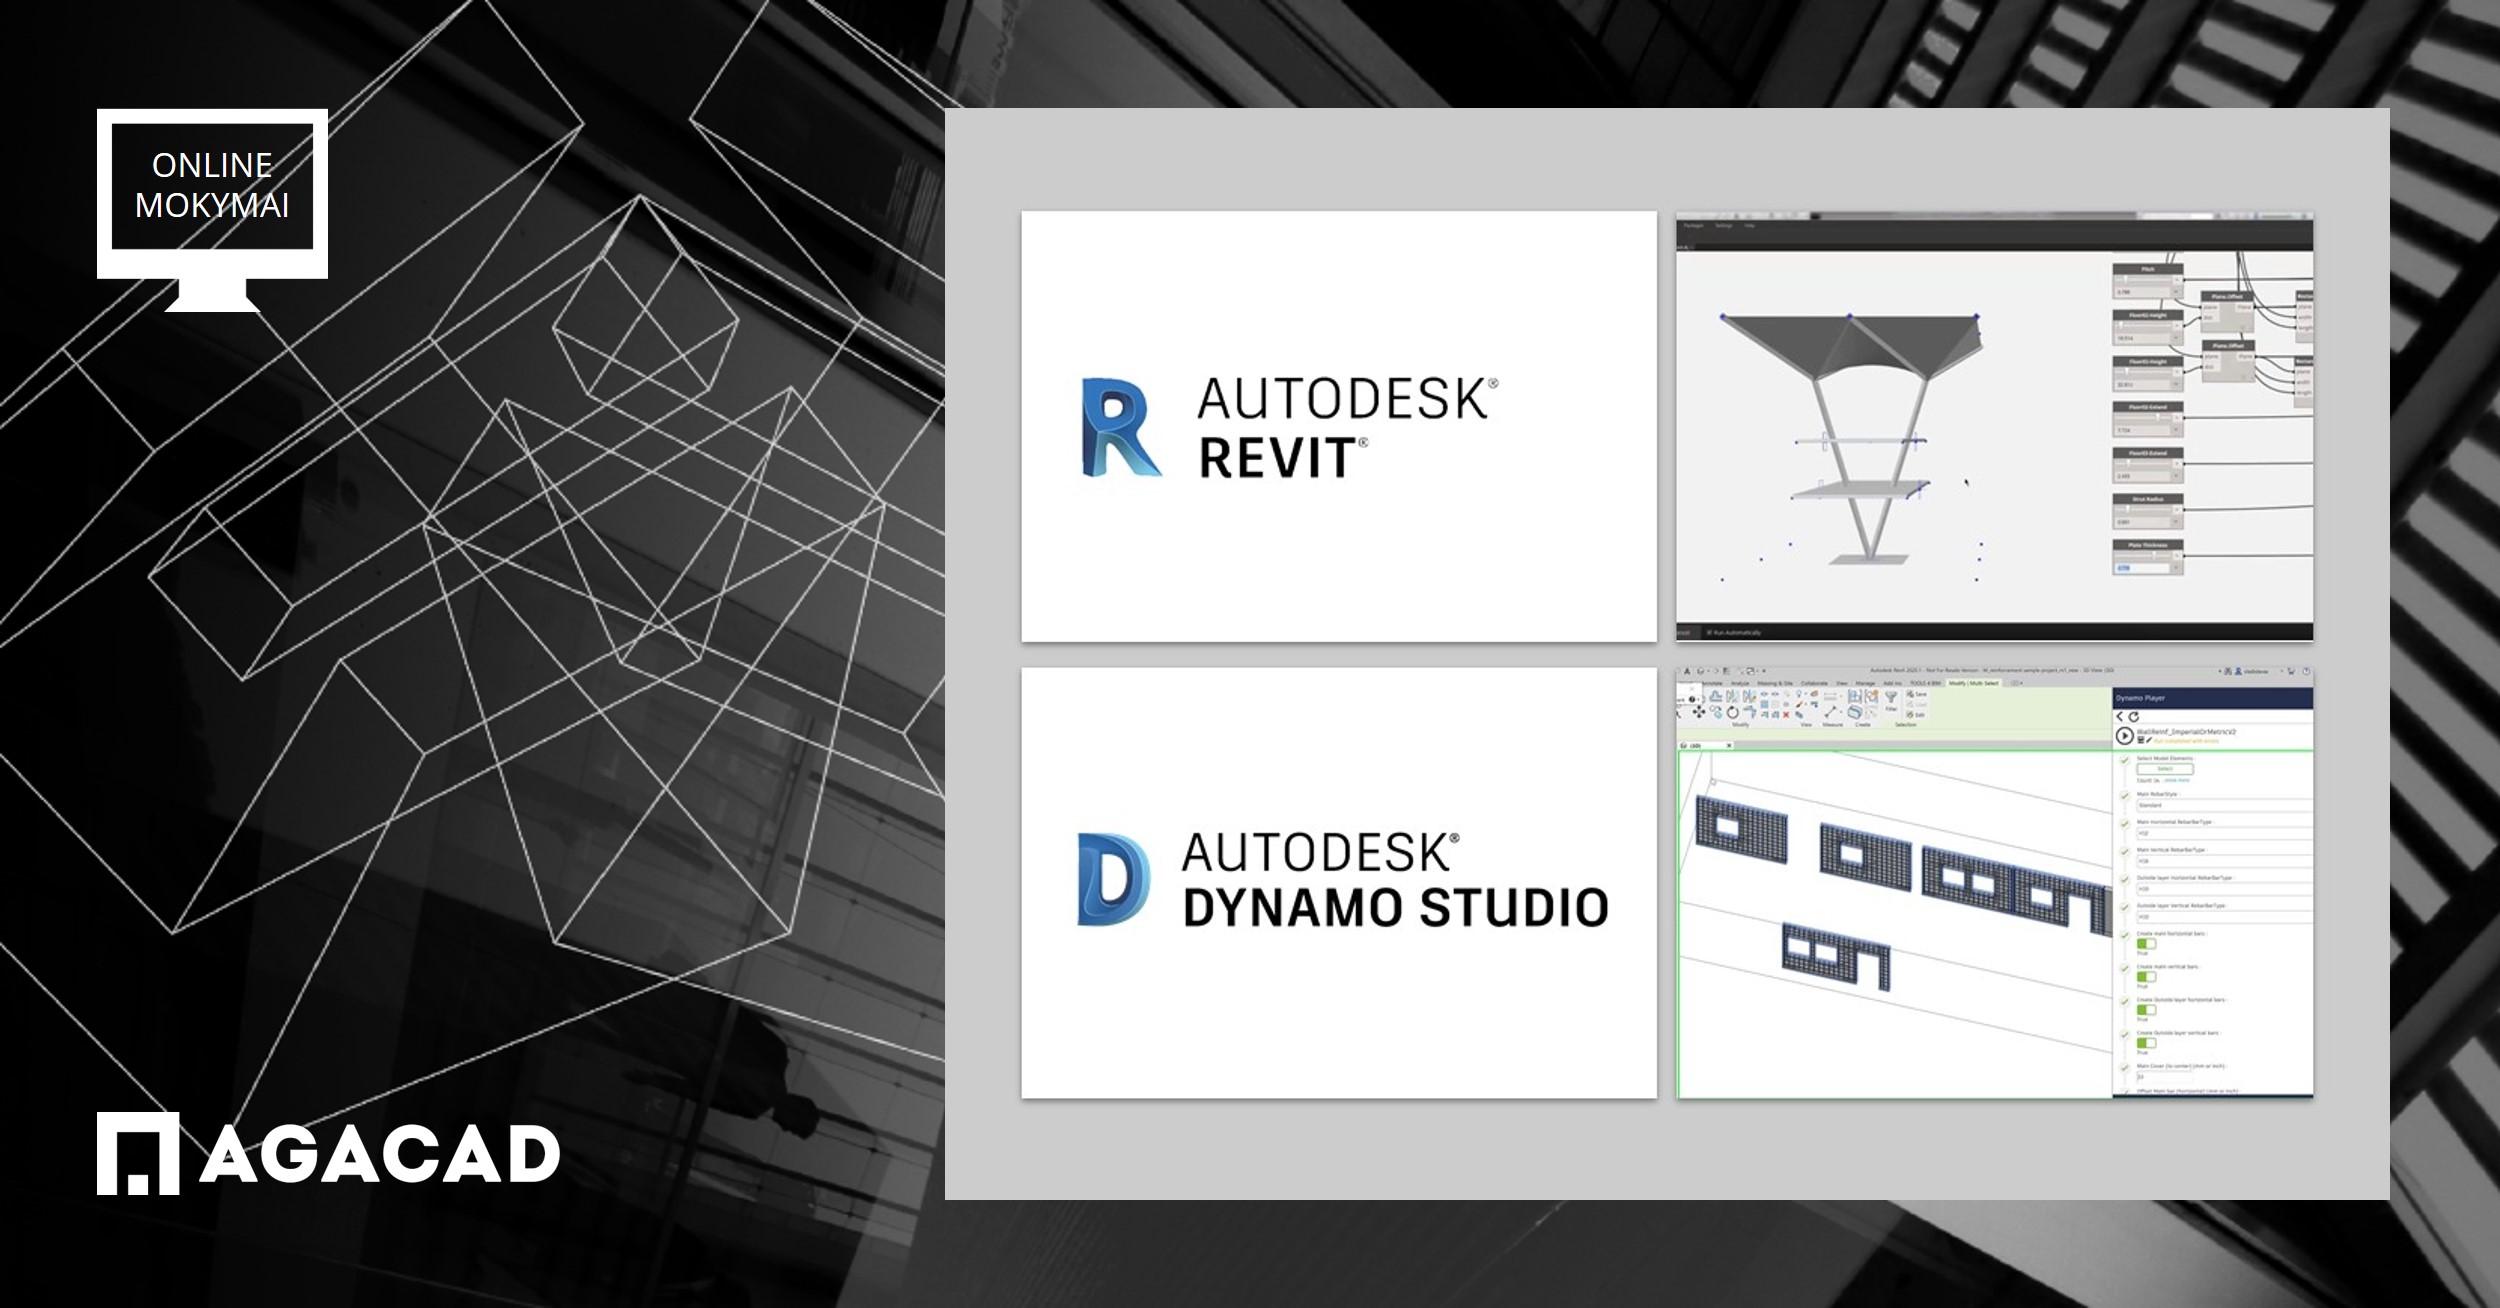 Autodesk Dynamo mokymo kursai| AGACAD mokymo centras